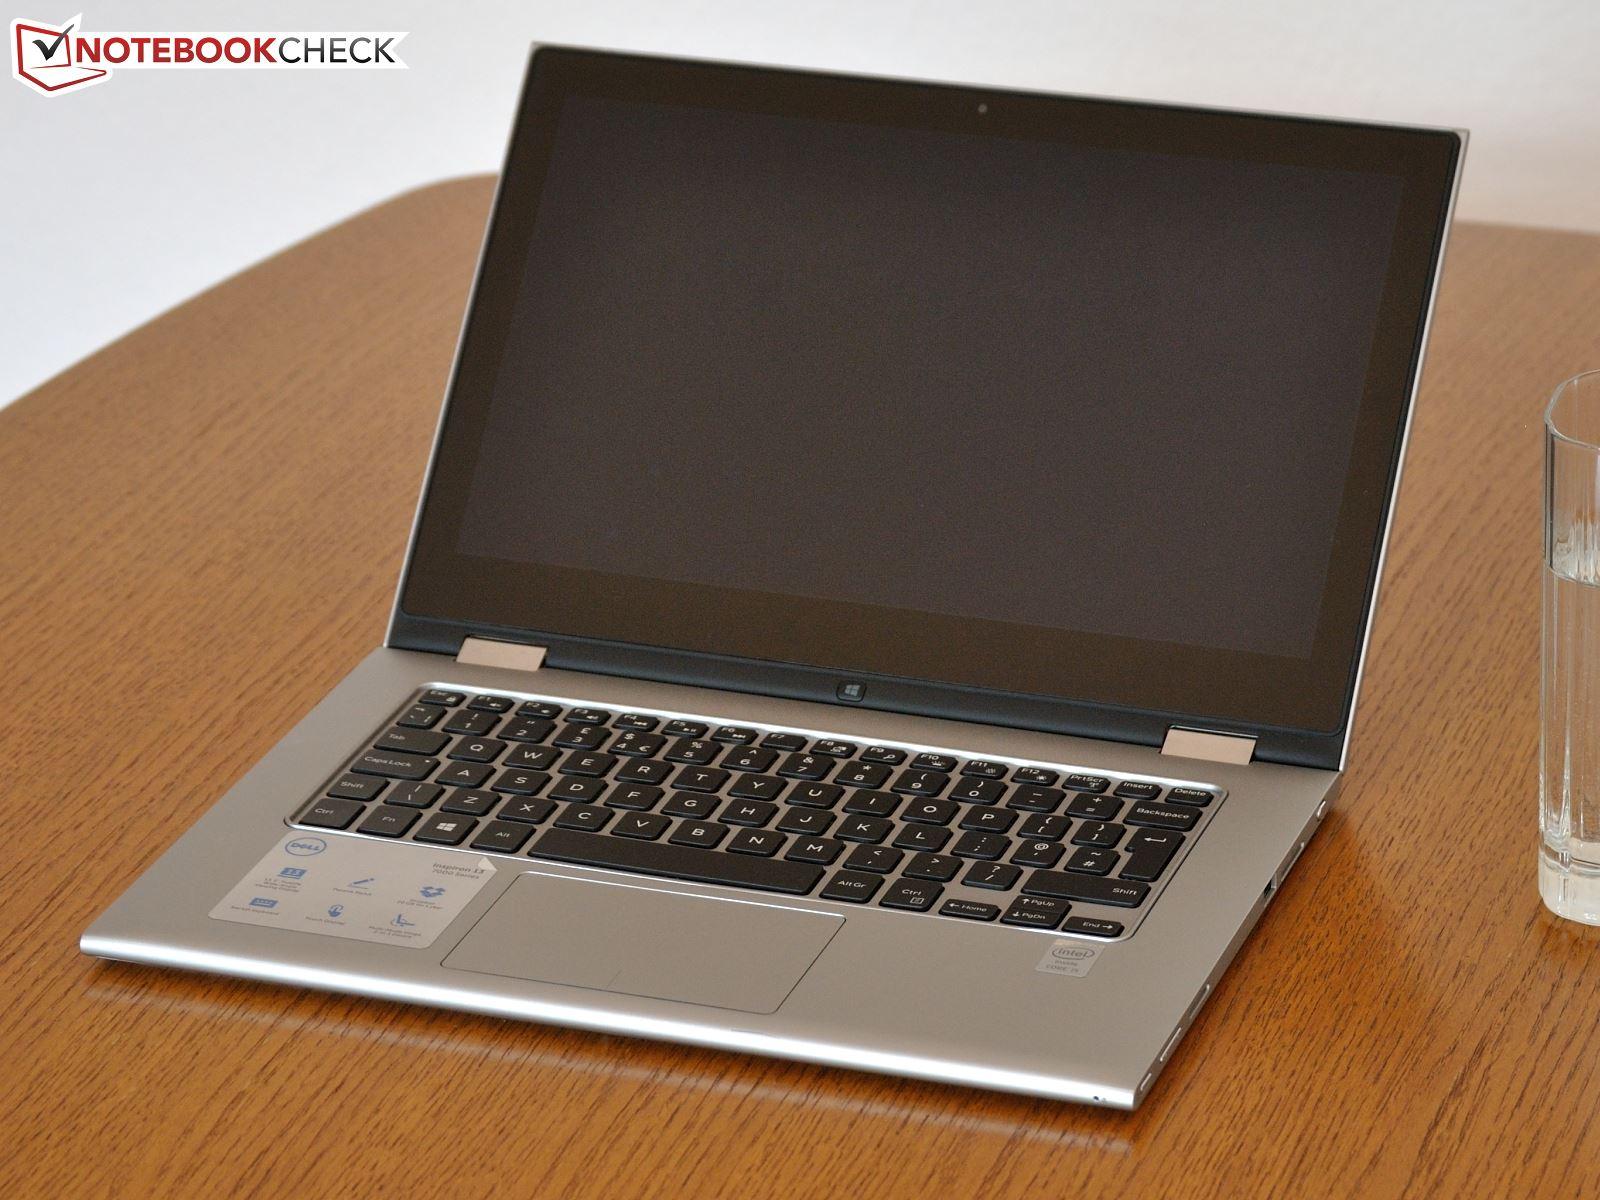 Test Dell Inspiron 13 7347 Convertible Notebookcheck Com